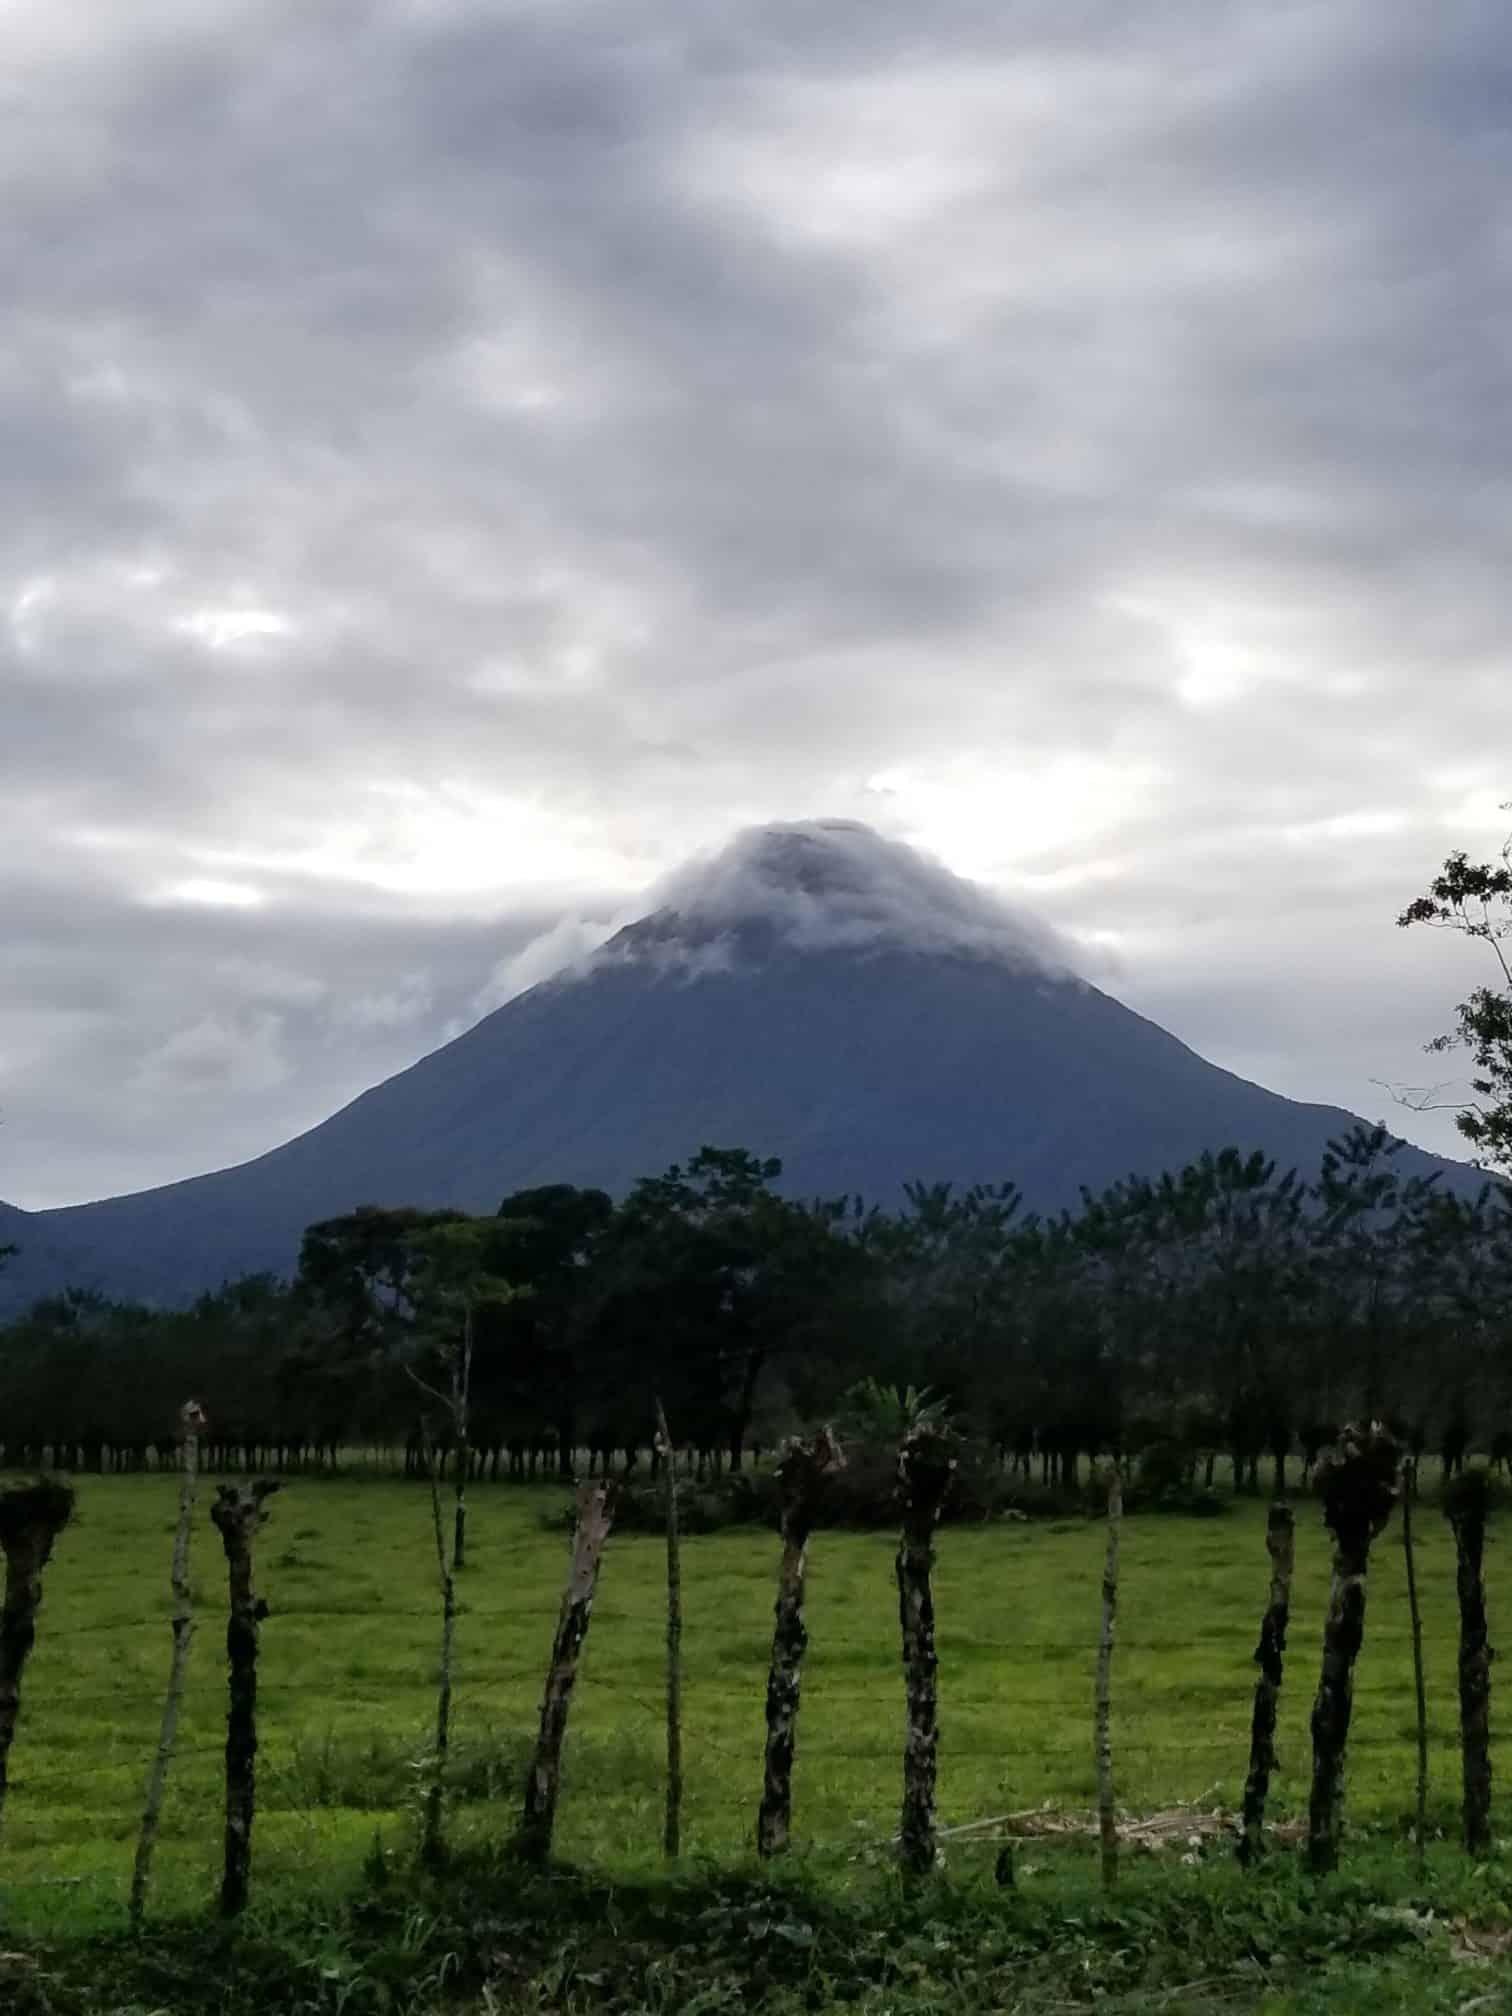 La Fortuna, Costa Rica: 13 of the Best Adventures, Activities and Attractions